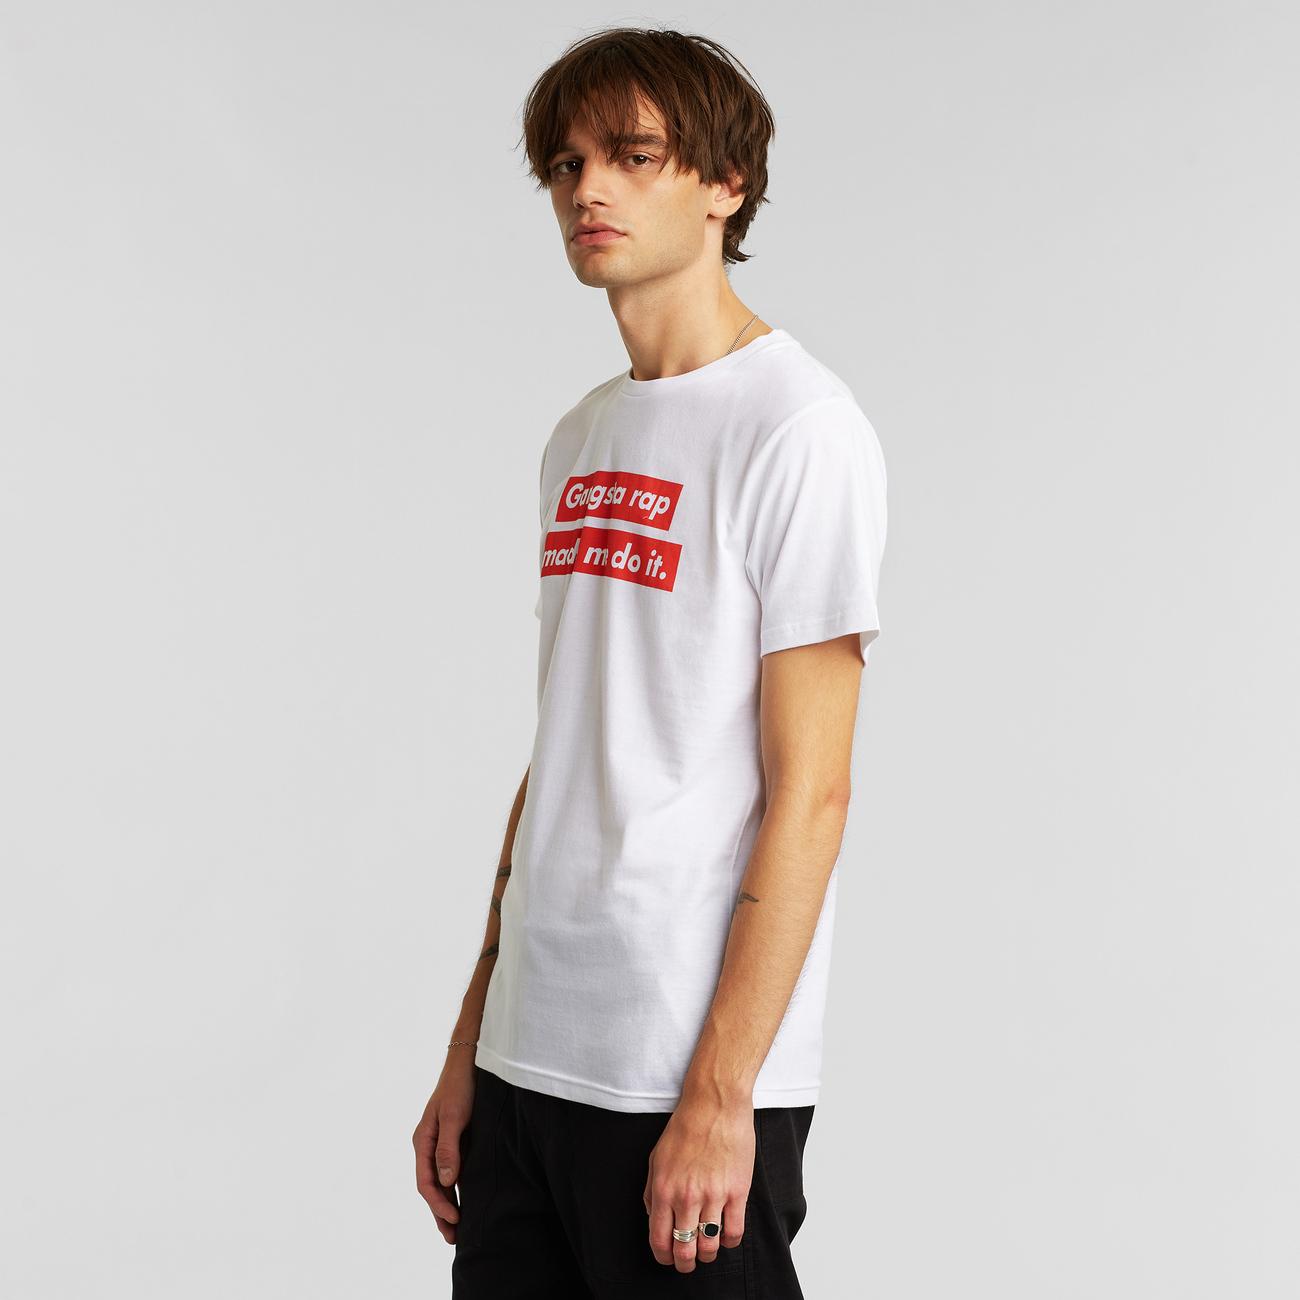 T-shirt Stockholm Gangsta Rap